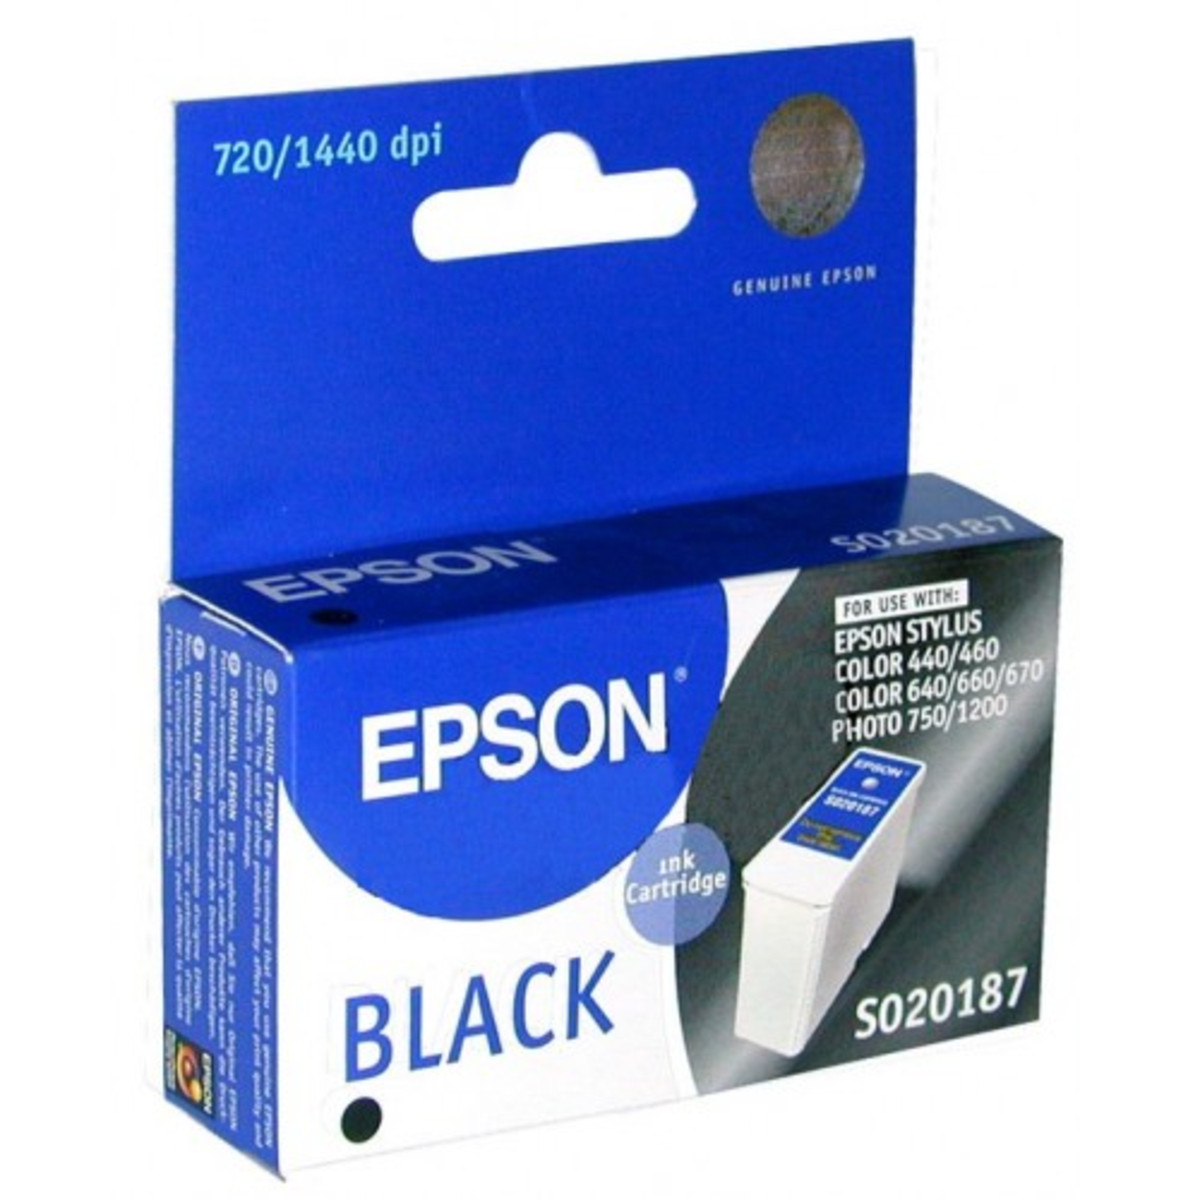 Epson T050190 Black Ink Cartridge - Exp 2014